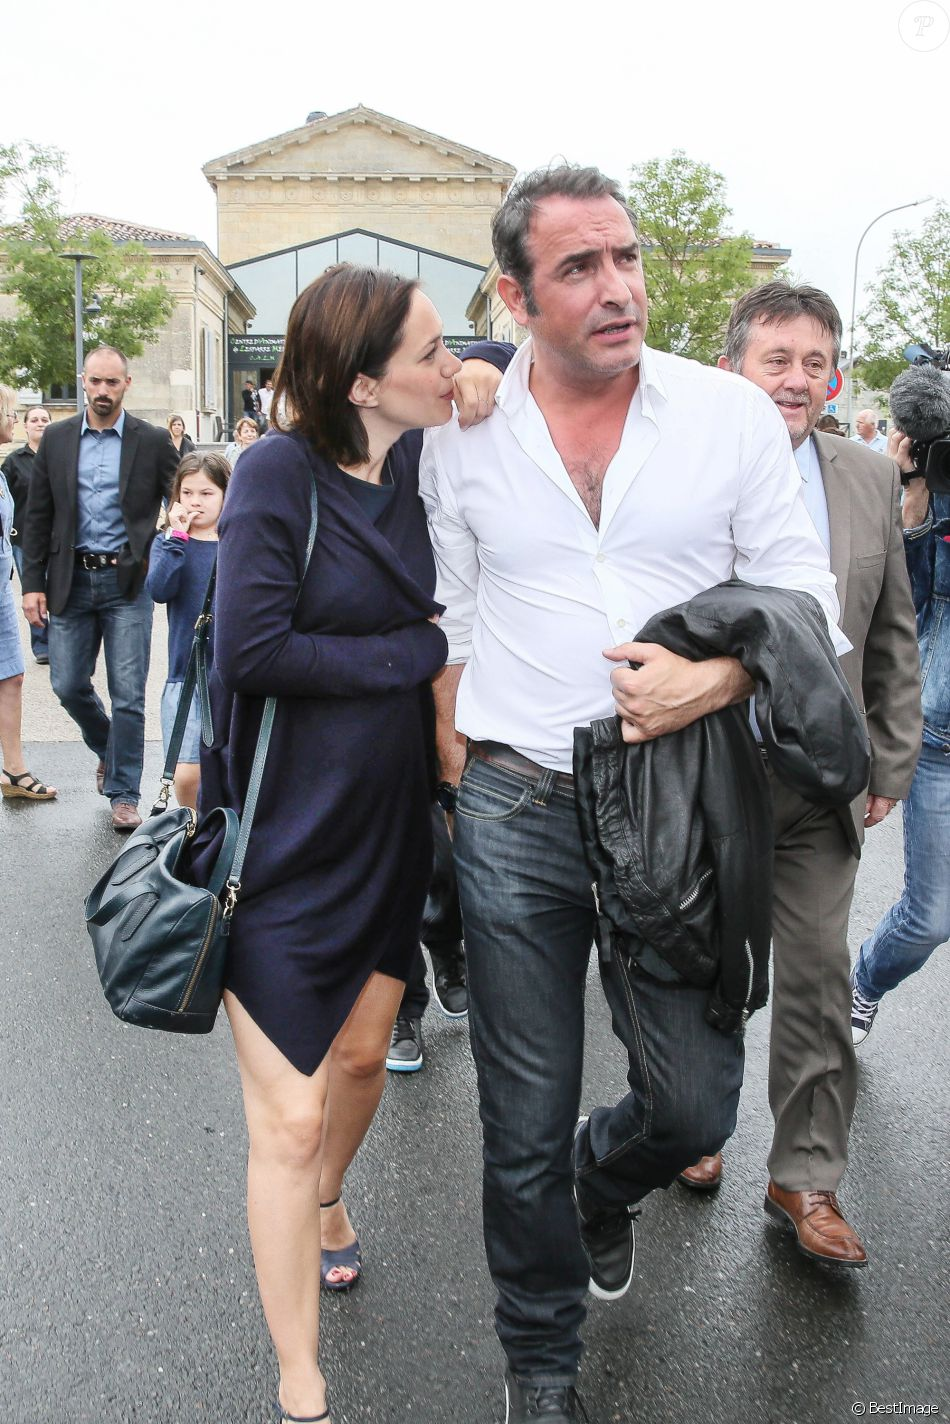 Jean dujardin et sa compagne nathalie p chalat enceinte for Compagne de jean dujardin